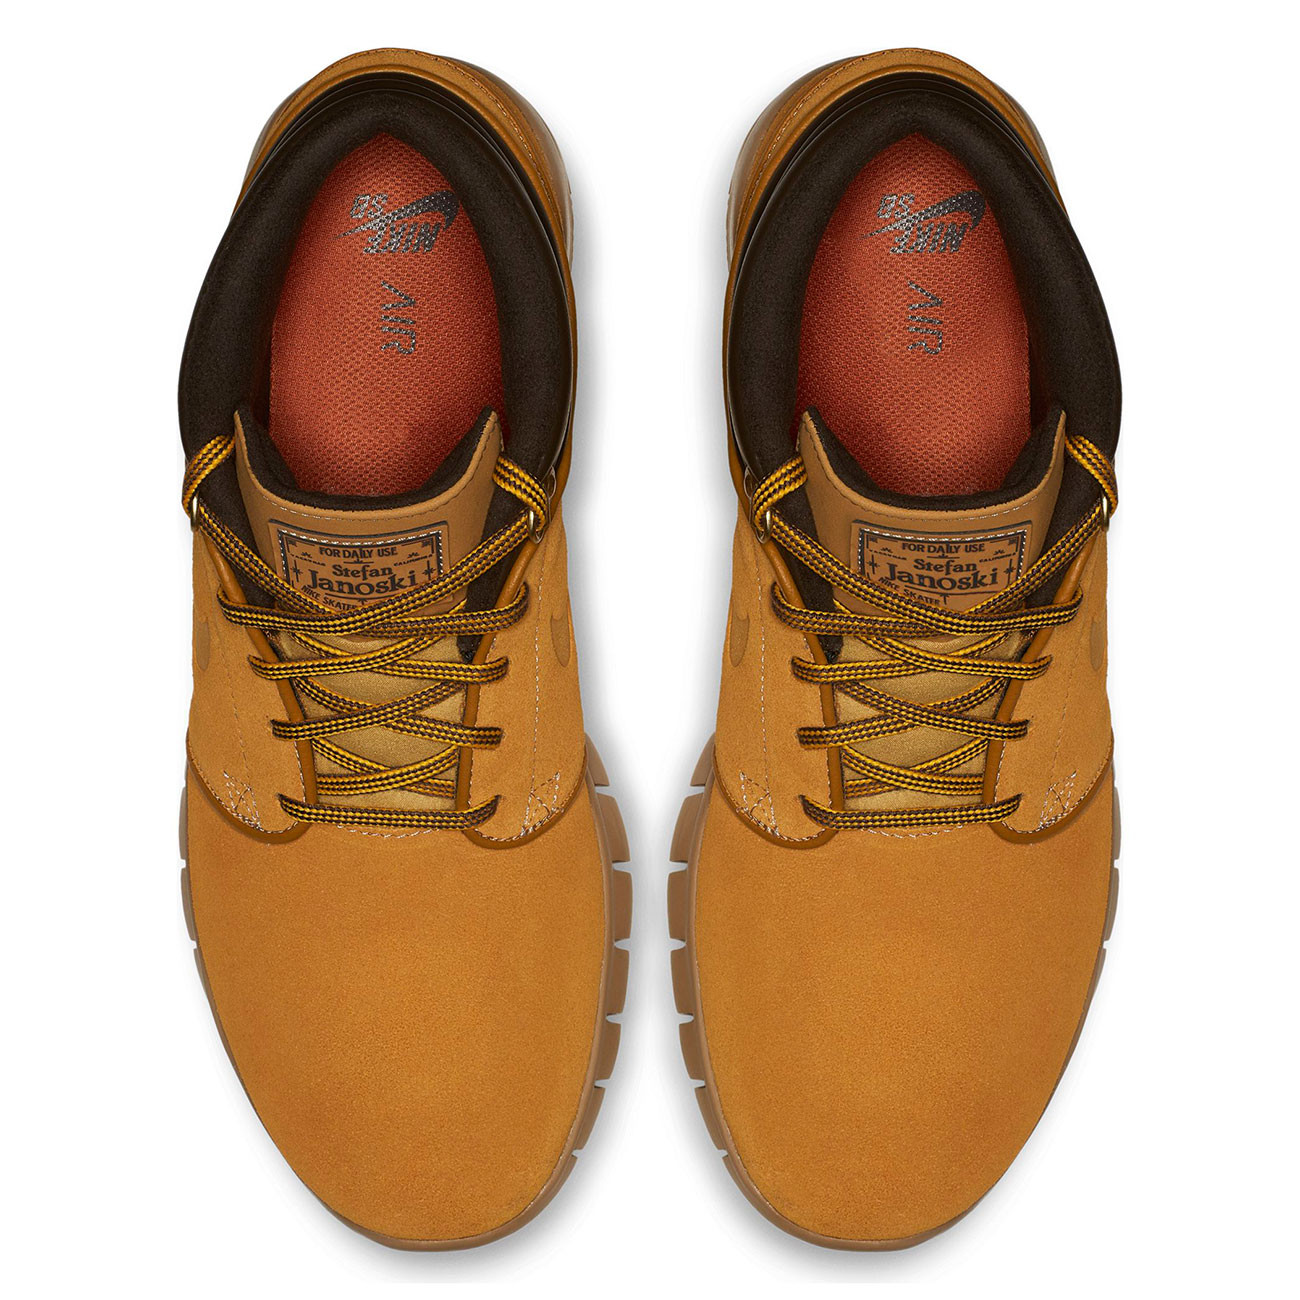 finest selection 4d902 4561a Sneakers Nike SB Stefan Janoski Max Mid Premium bronze/bronze-gum ...